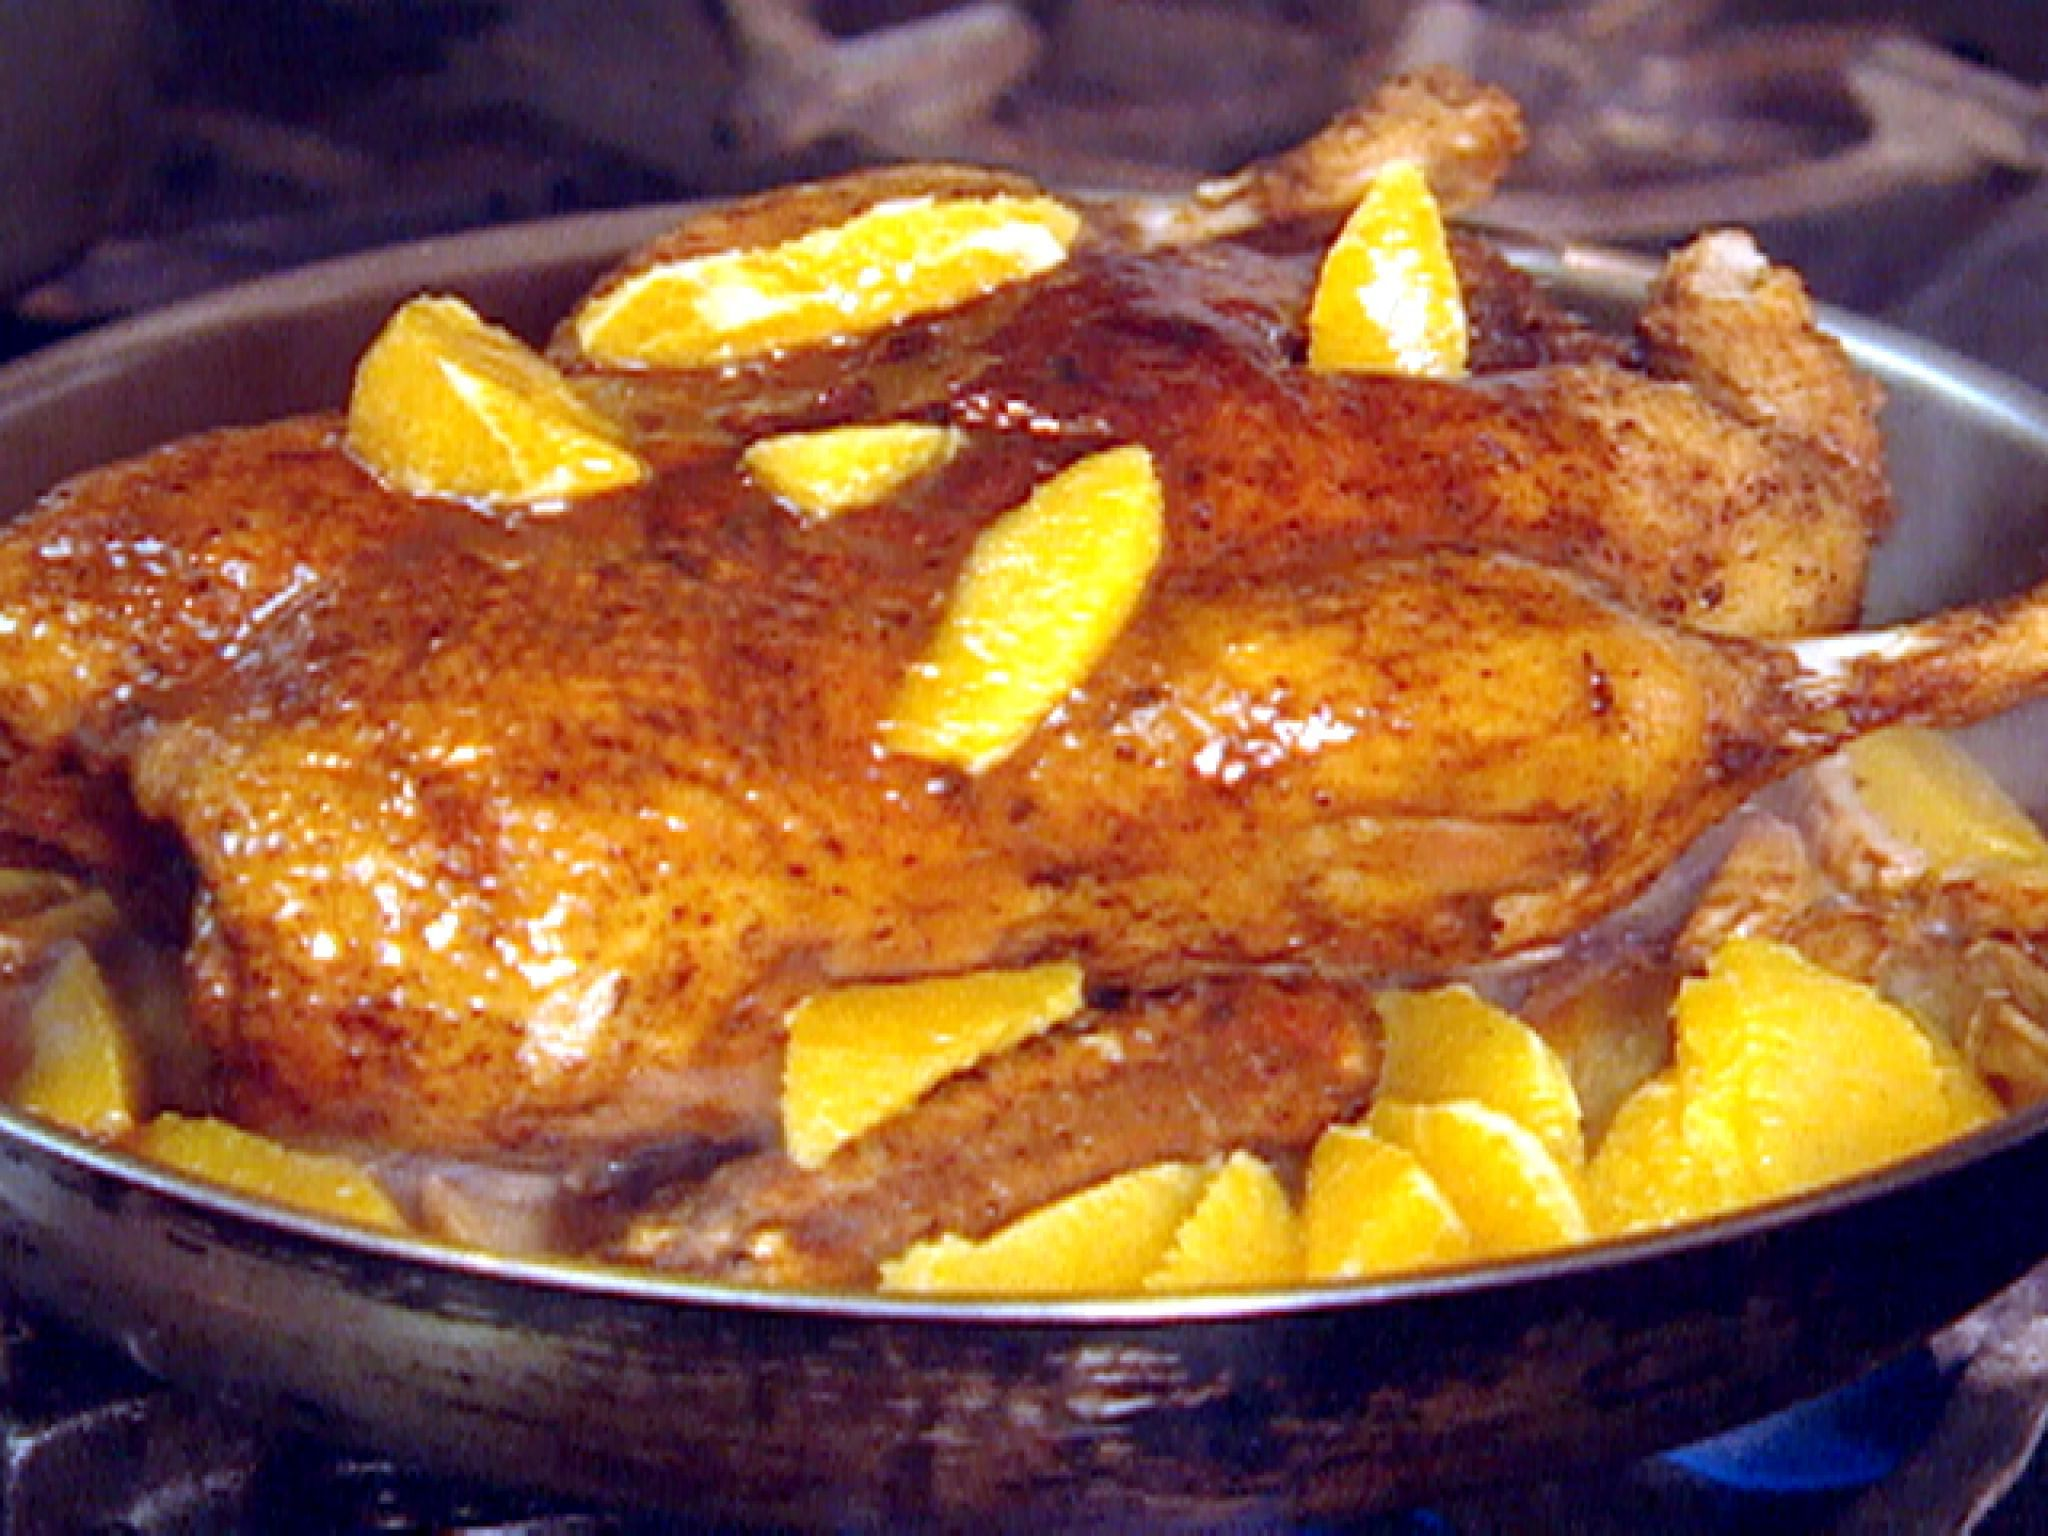 Roasted duck with orange ginger glaze receta forumfinder Images